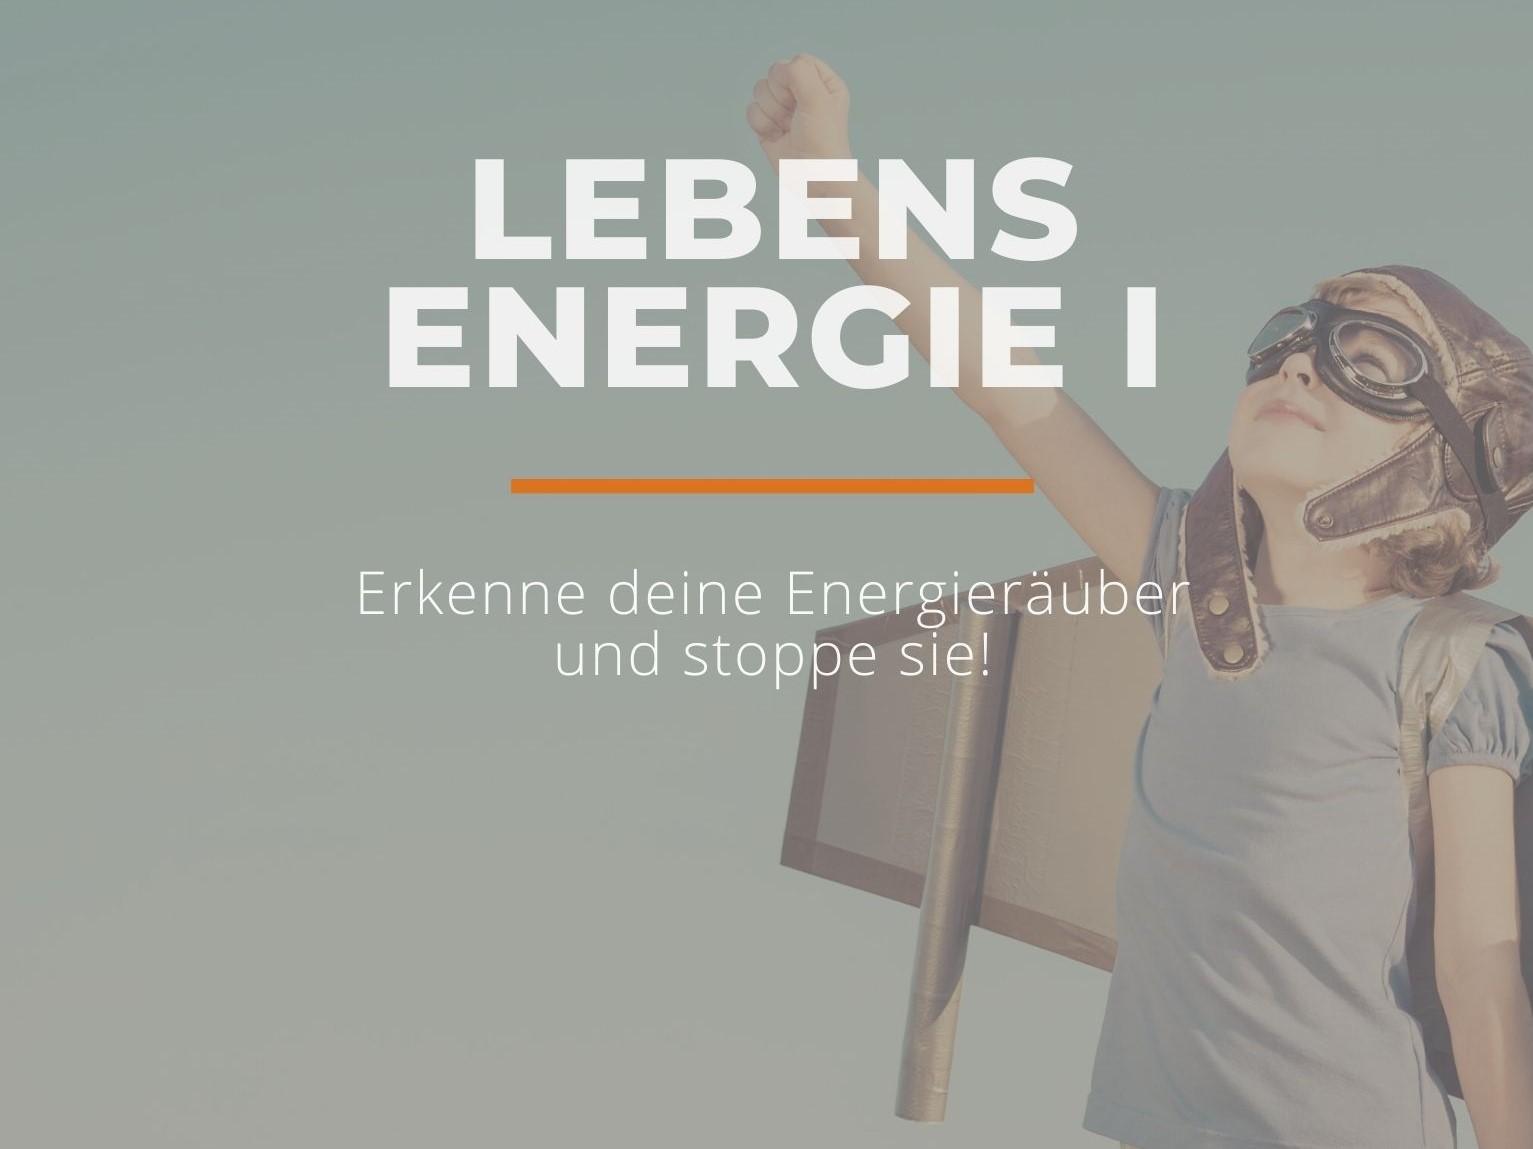 Deine Lebensenergie I